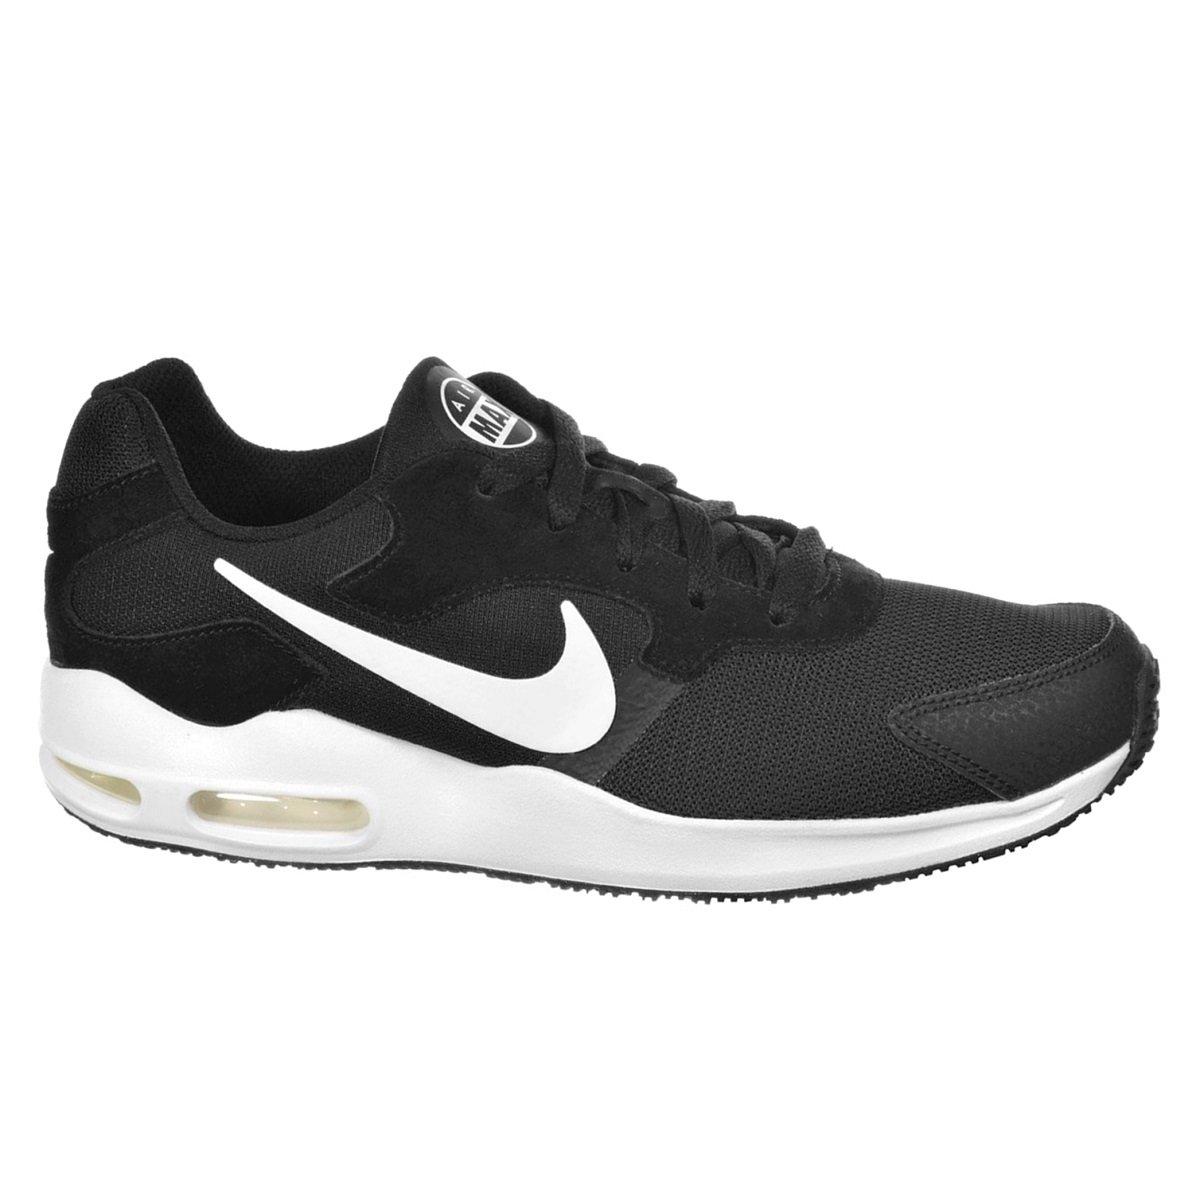 65a39b8152 Tênis Masculino Nike Air Max Guile 916768-004 - Preto/Branco - Botas ...